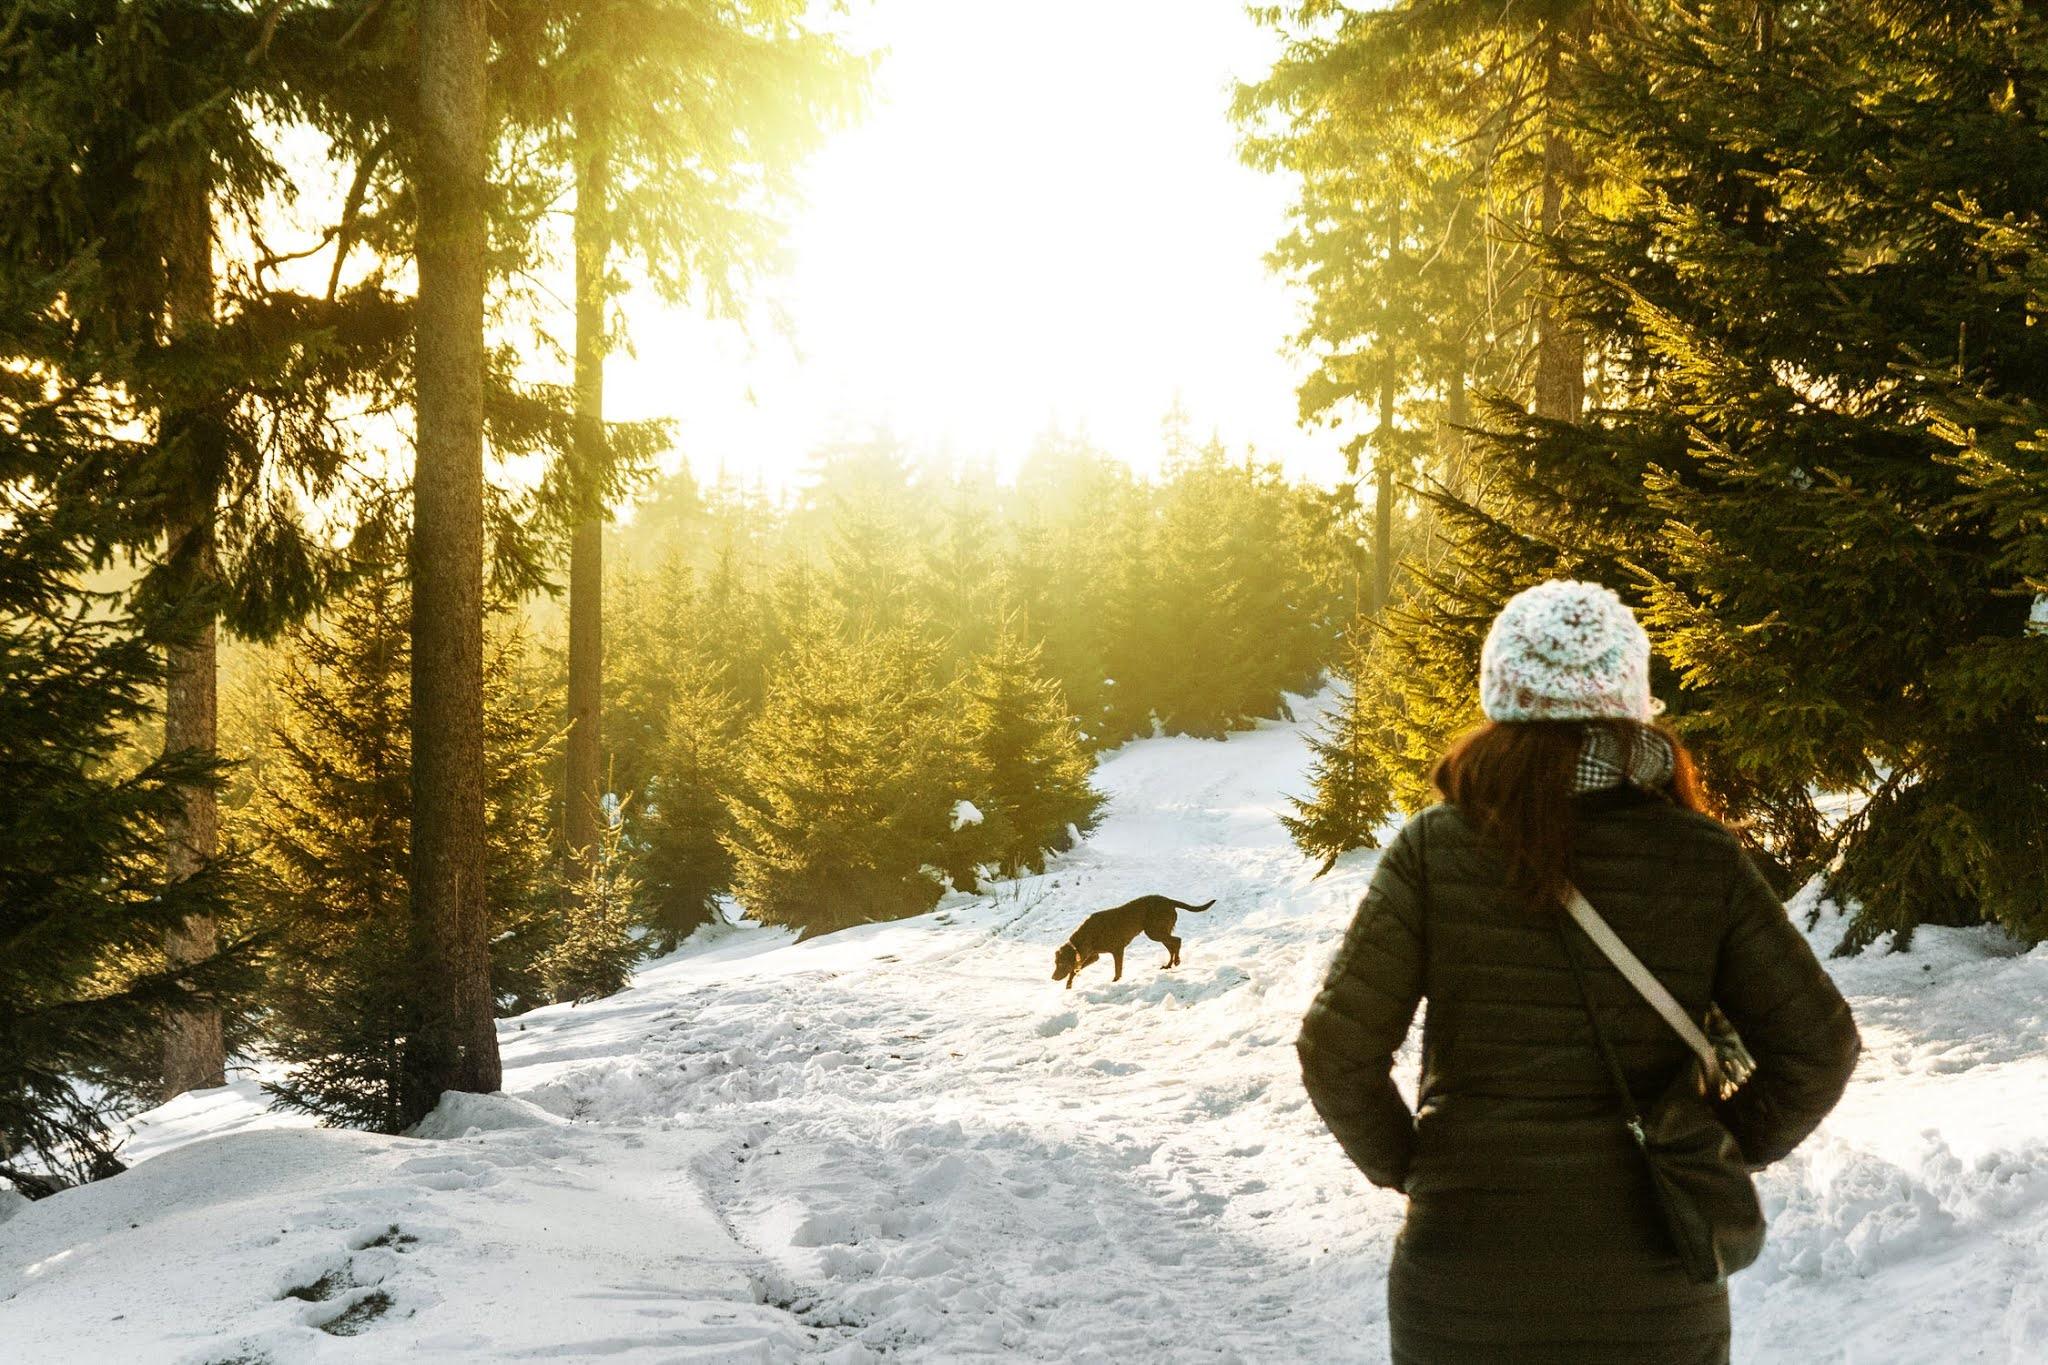 5 Ways to Enjoy Snow With Your dog